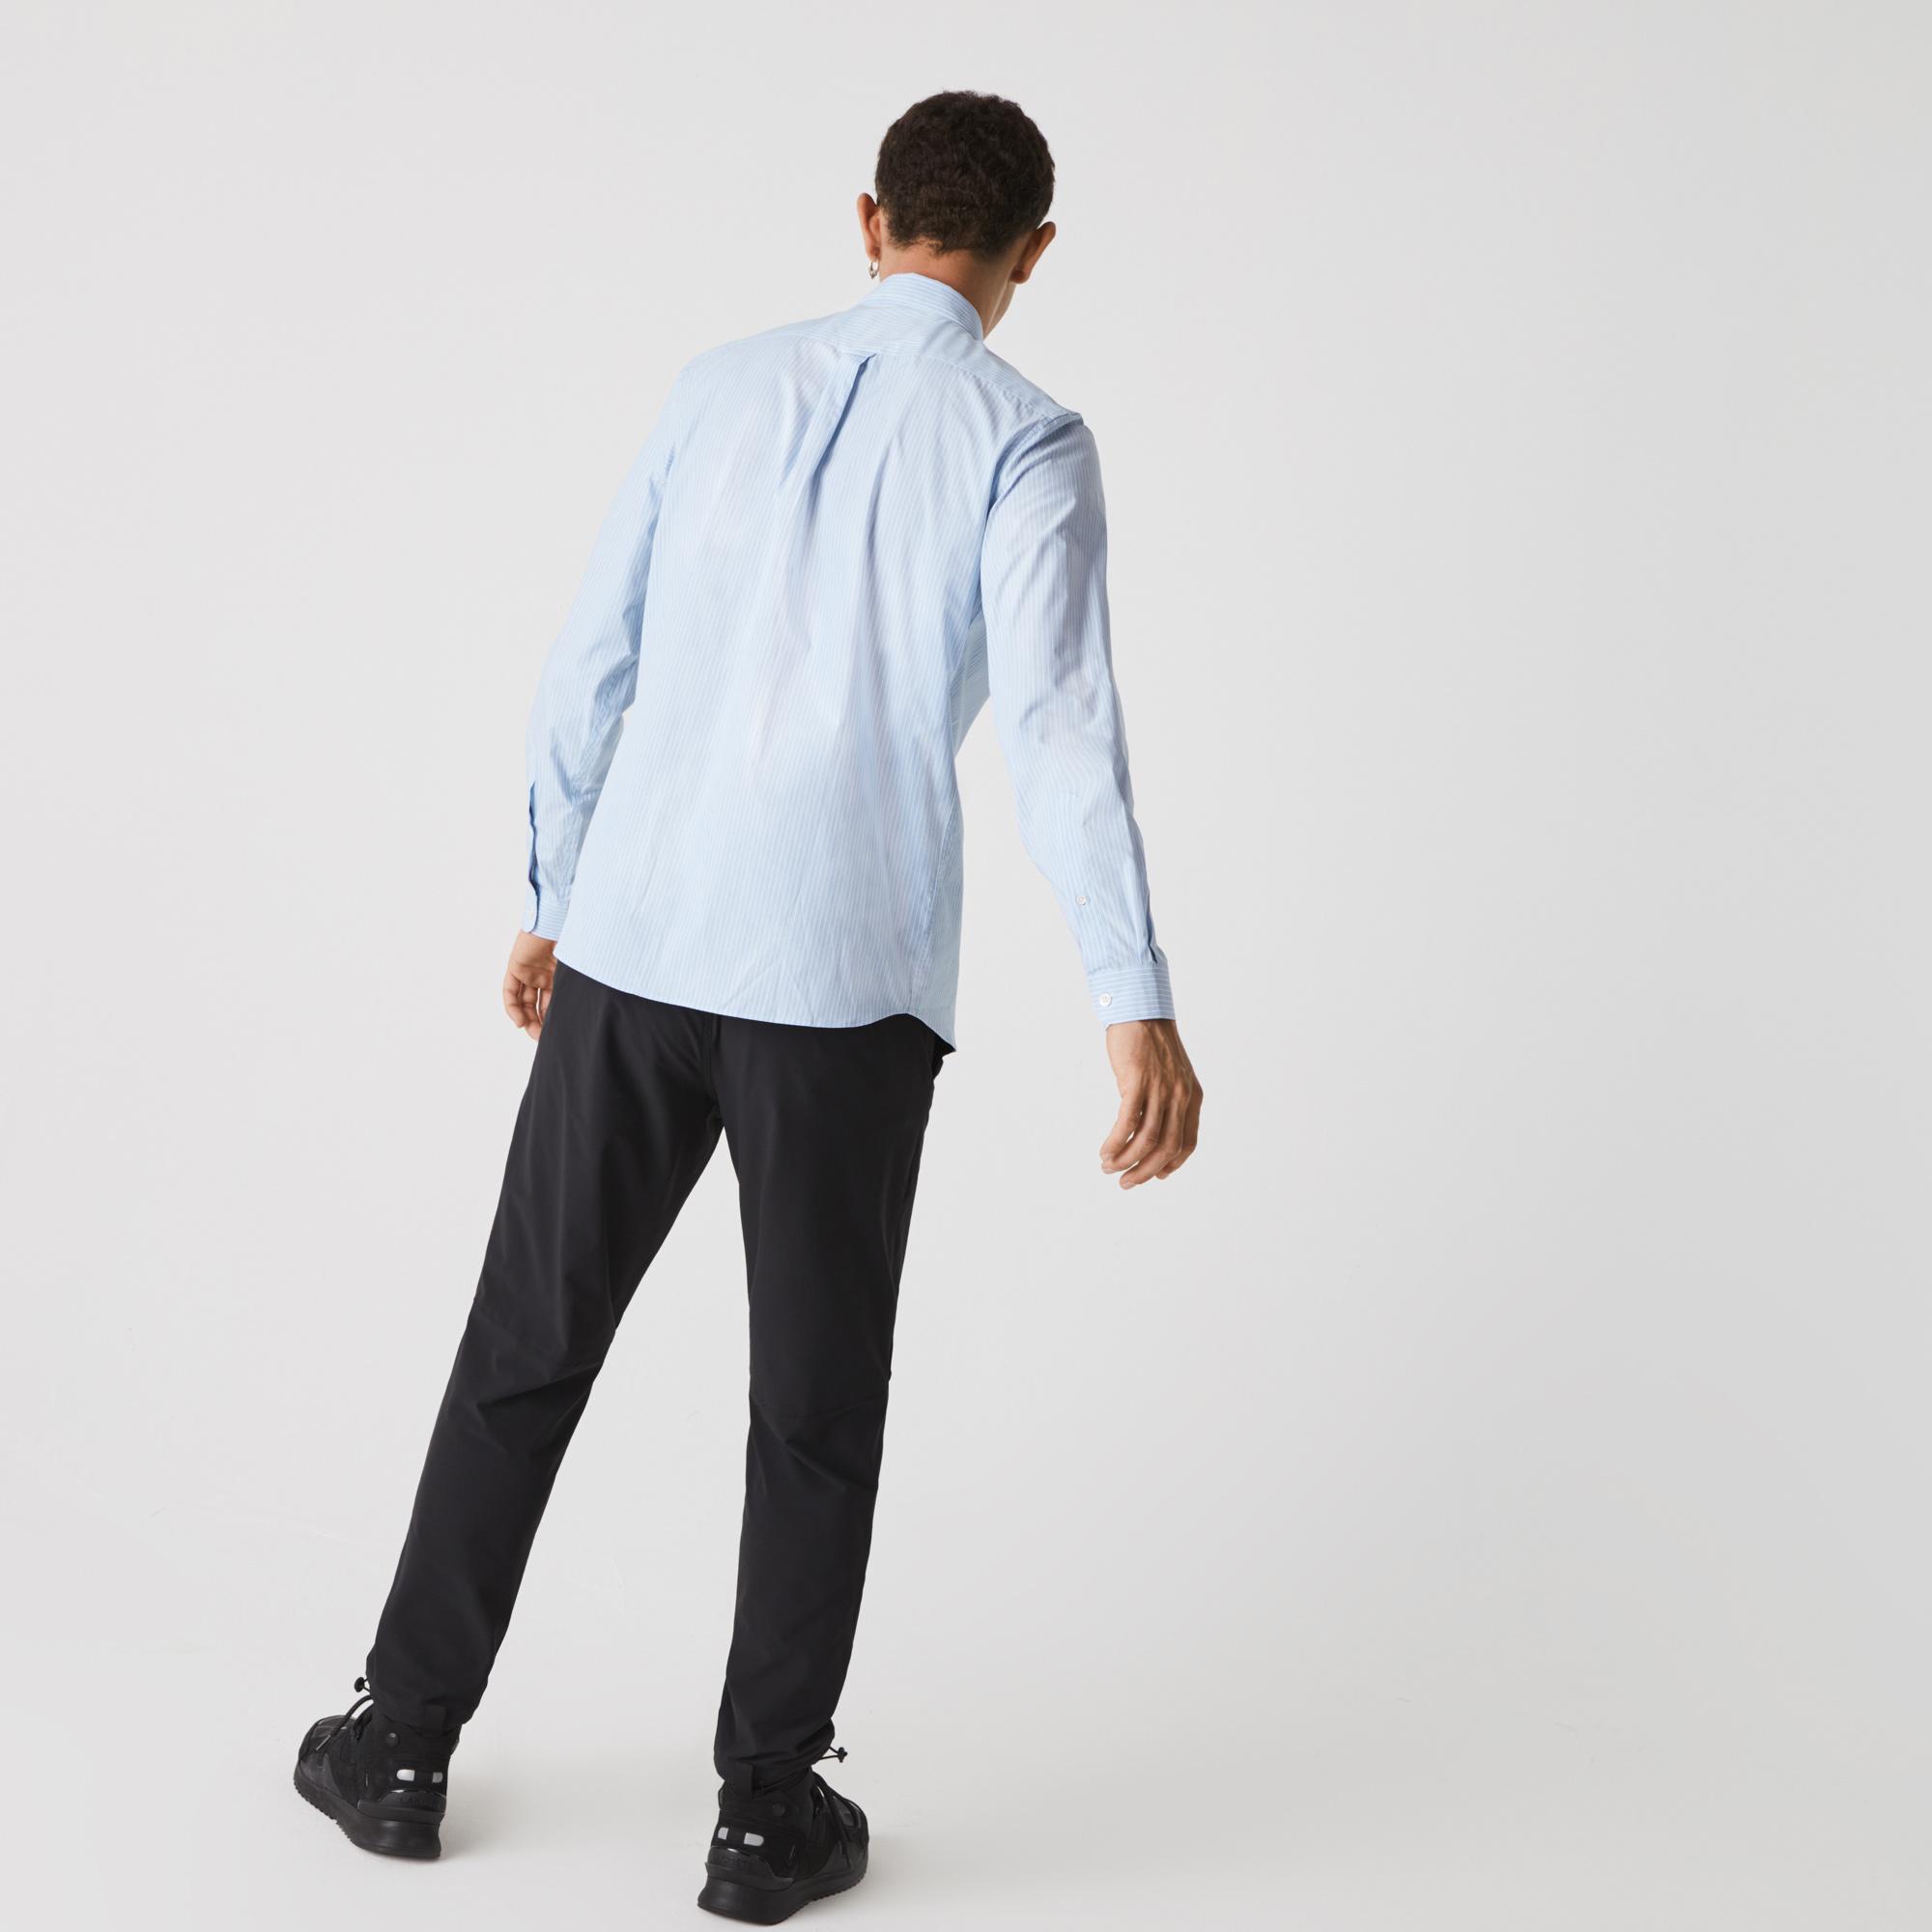 Lacoste x National Geographic Erkek Regular Fit Çizgili Mavi Gömlek